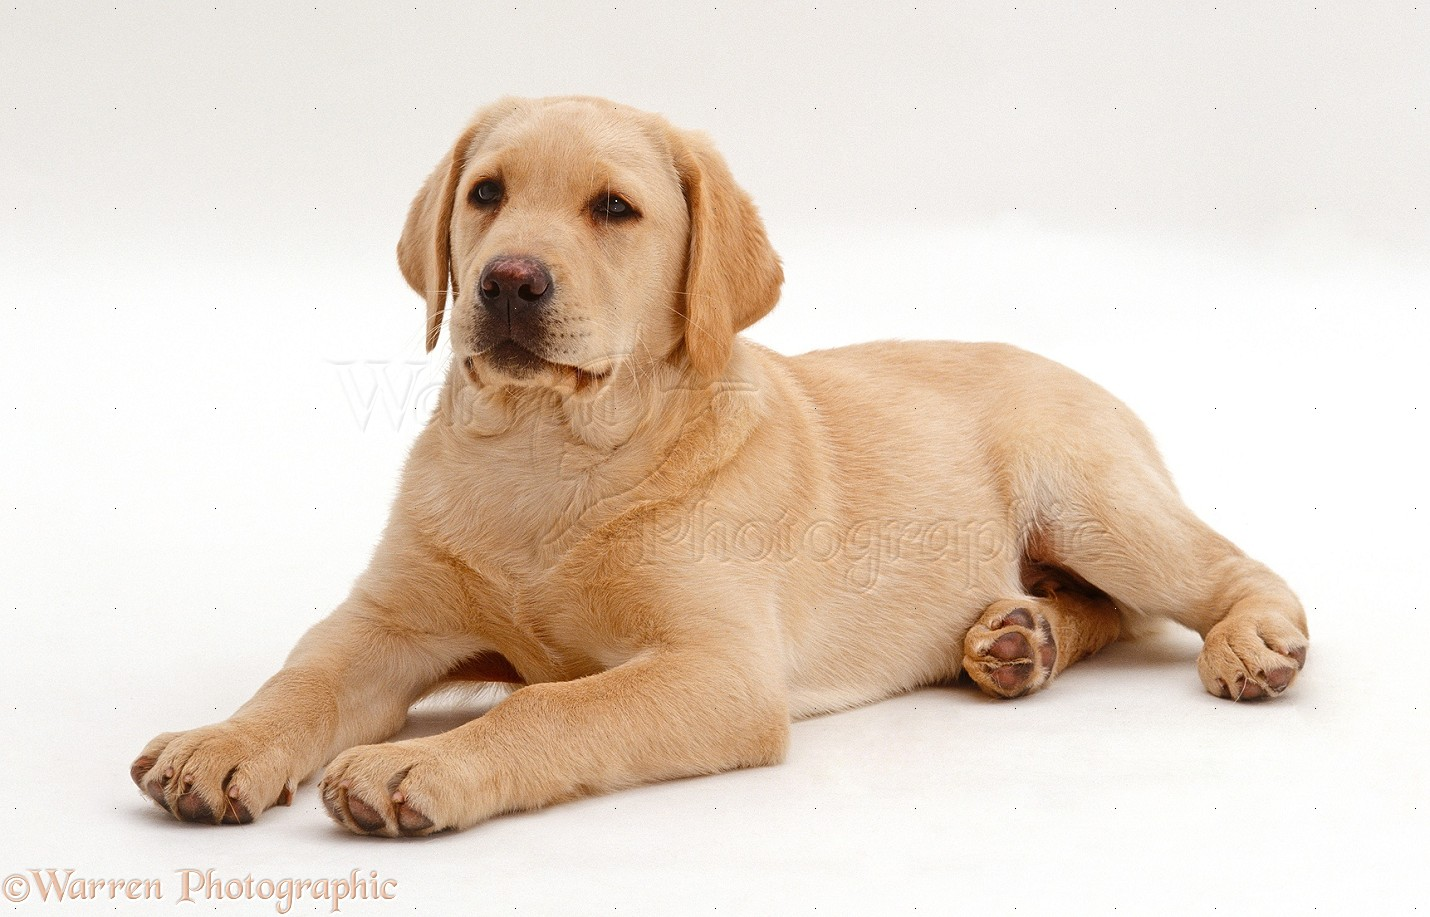 Dog Yellow Labrador Retriever Puppy Photo Wp24148